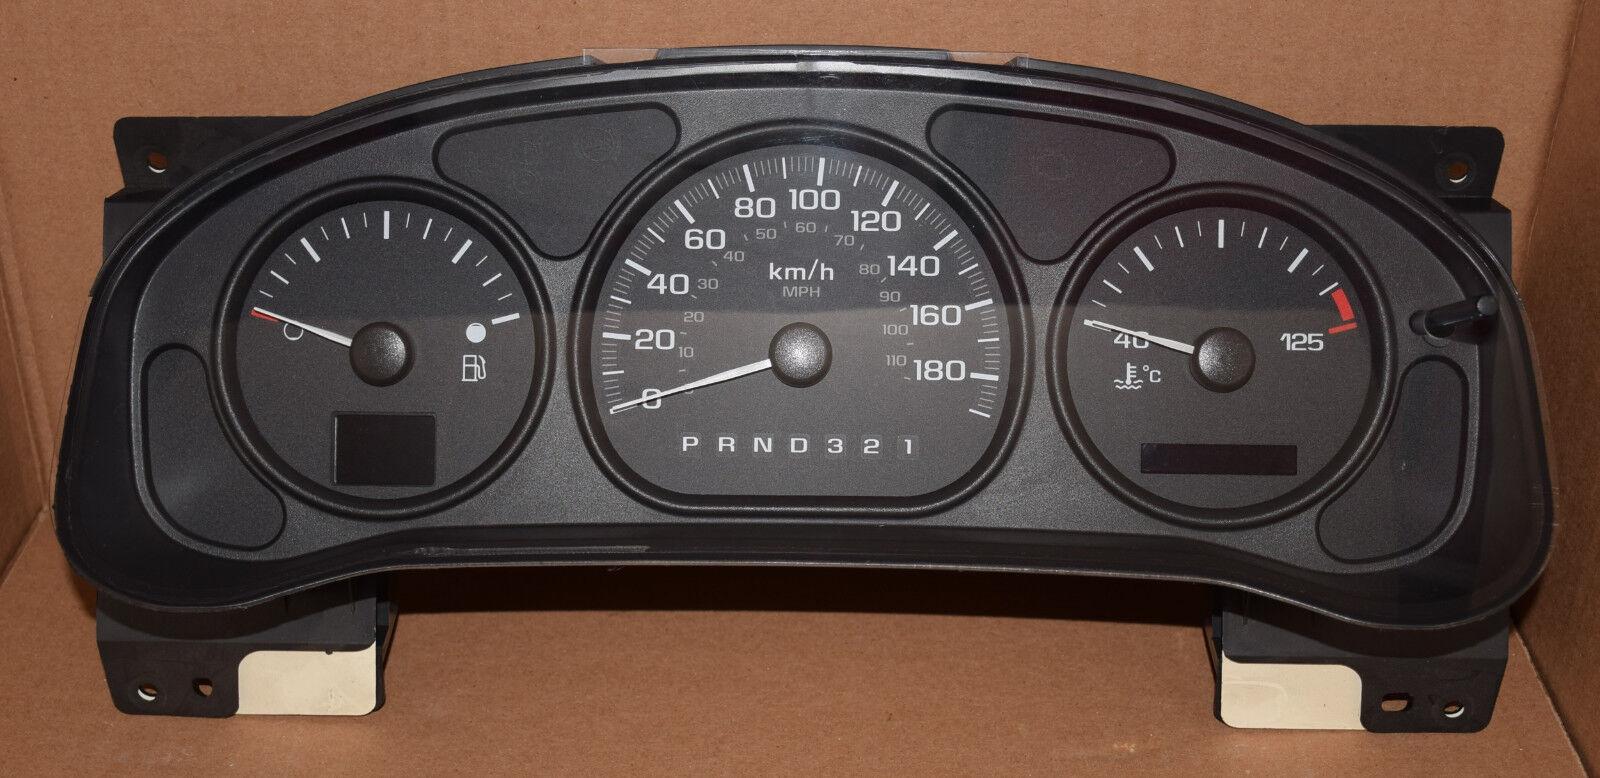 2003-2006 Chevrolet Venture Dashboard Instrument Cluster Repair